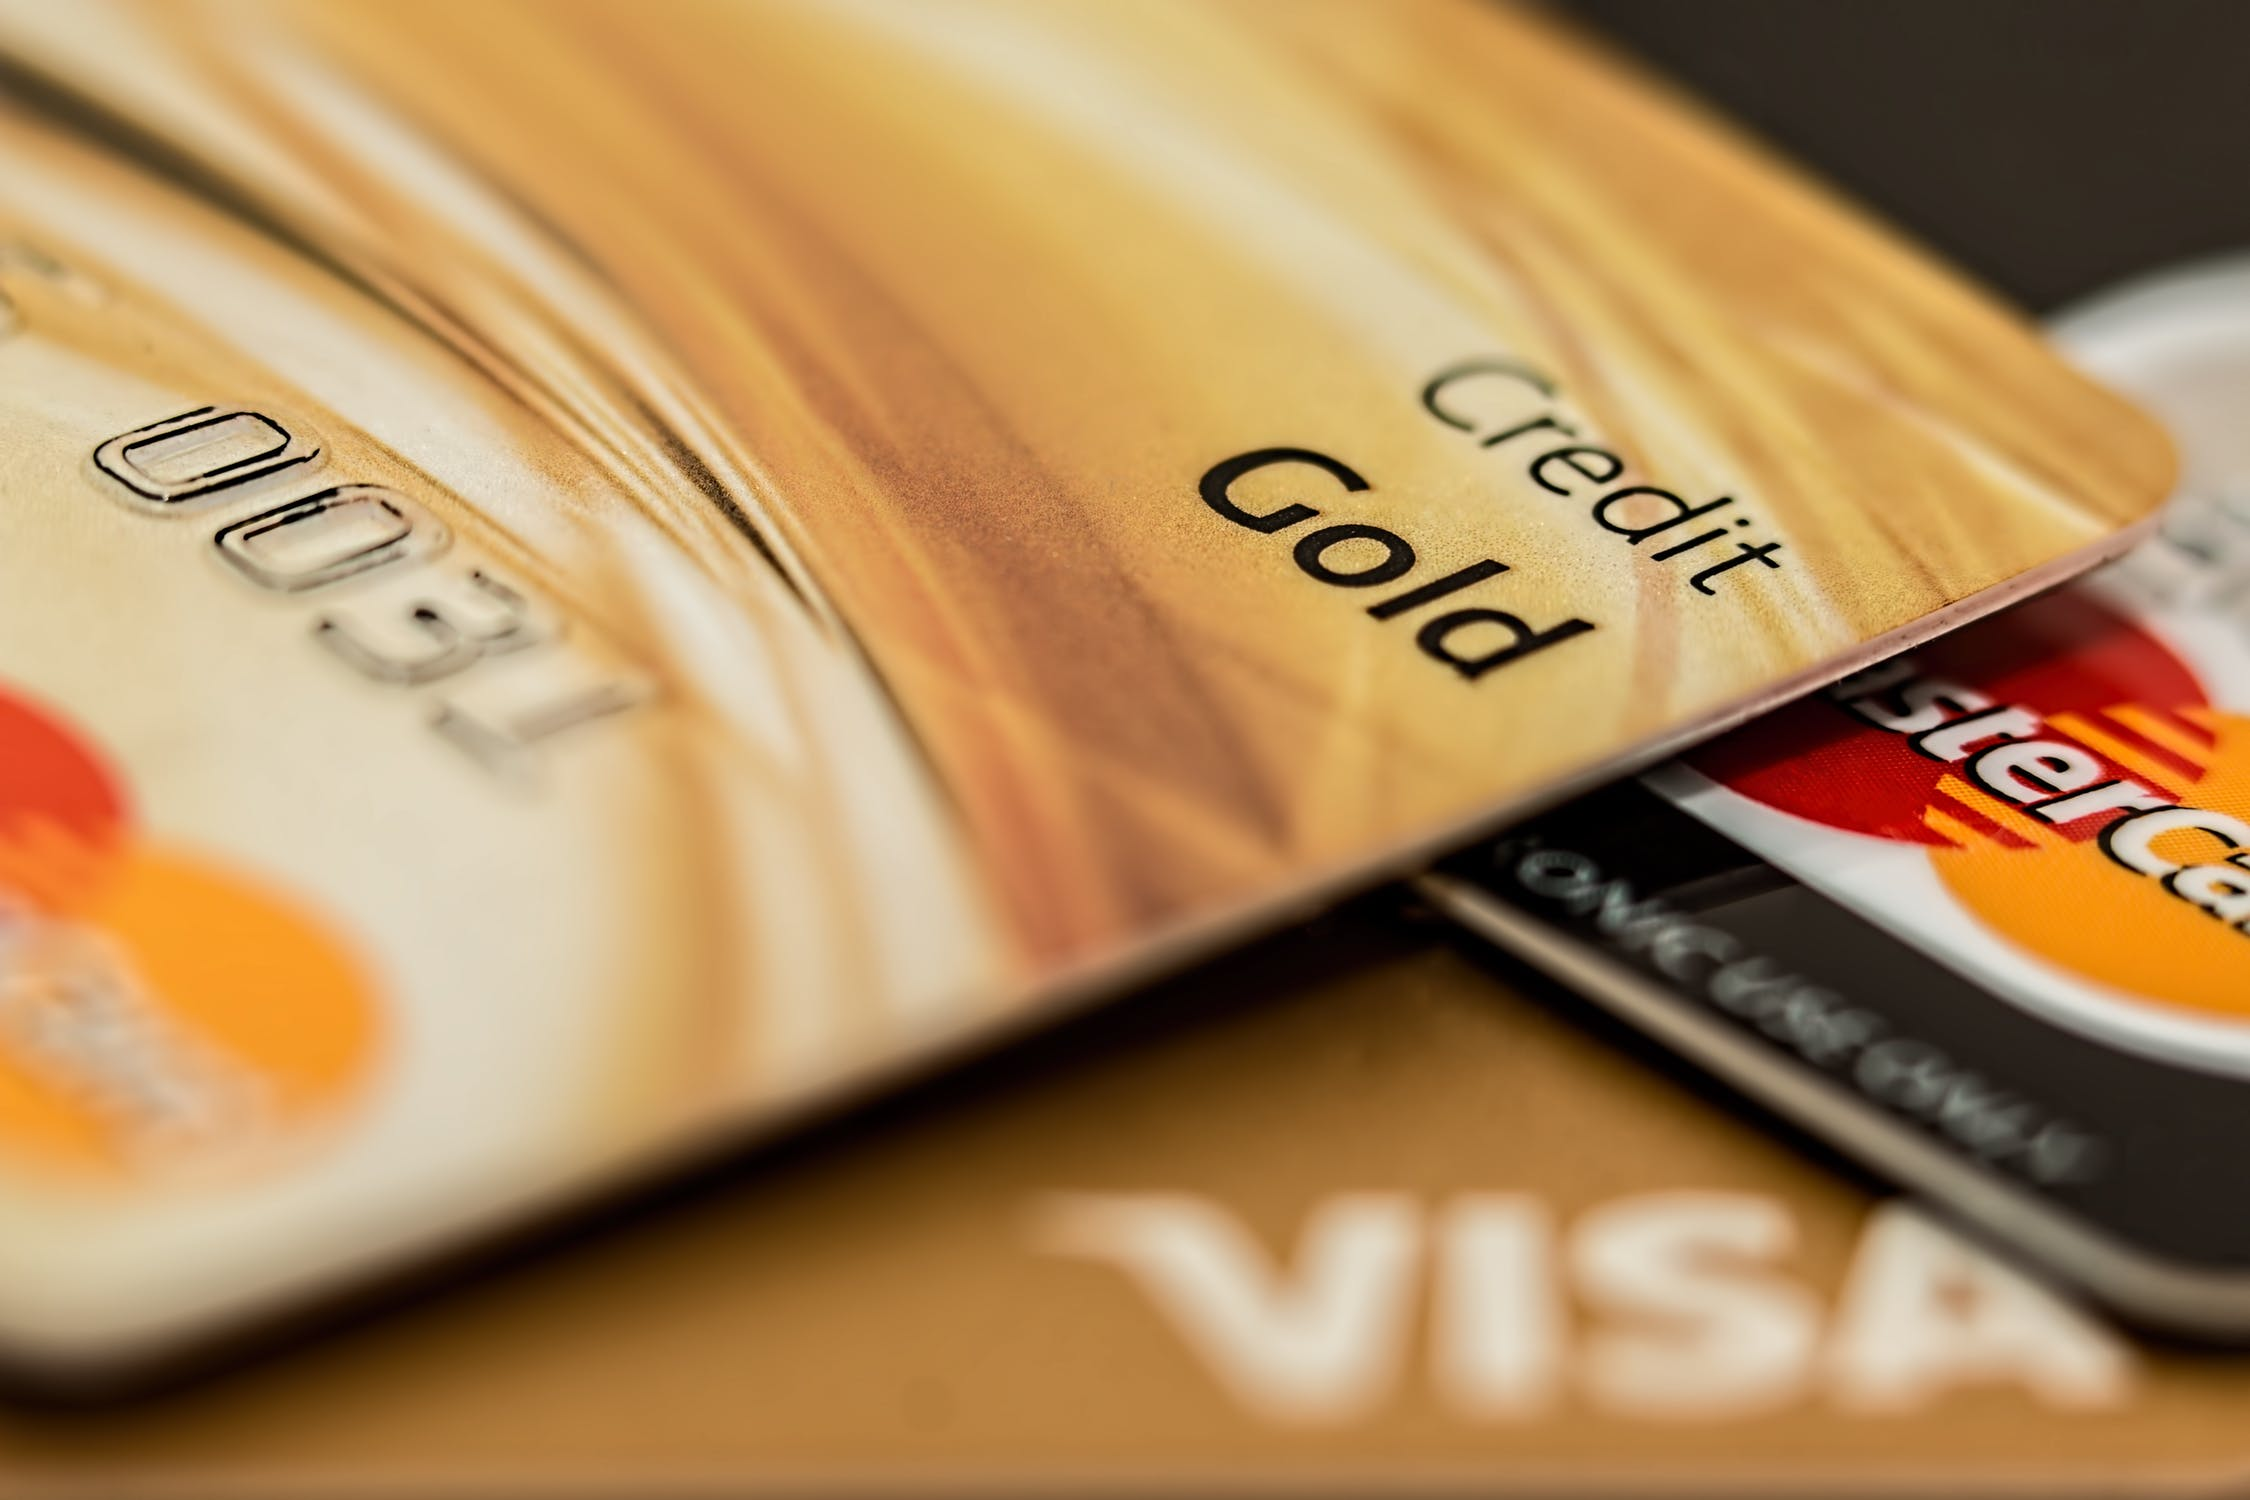 Google Pay的美国用户现在可以向印度和新加坡的用户汇款